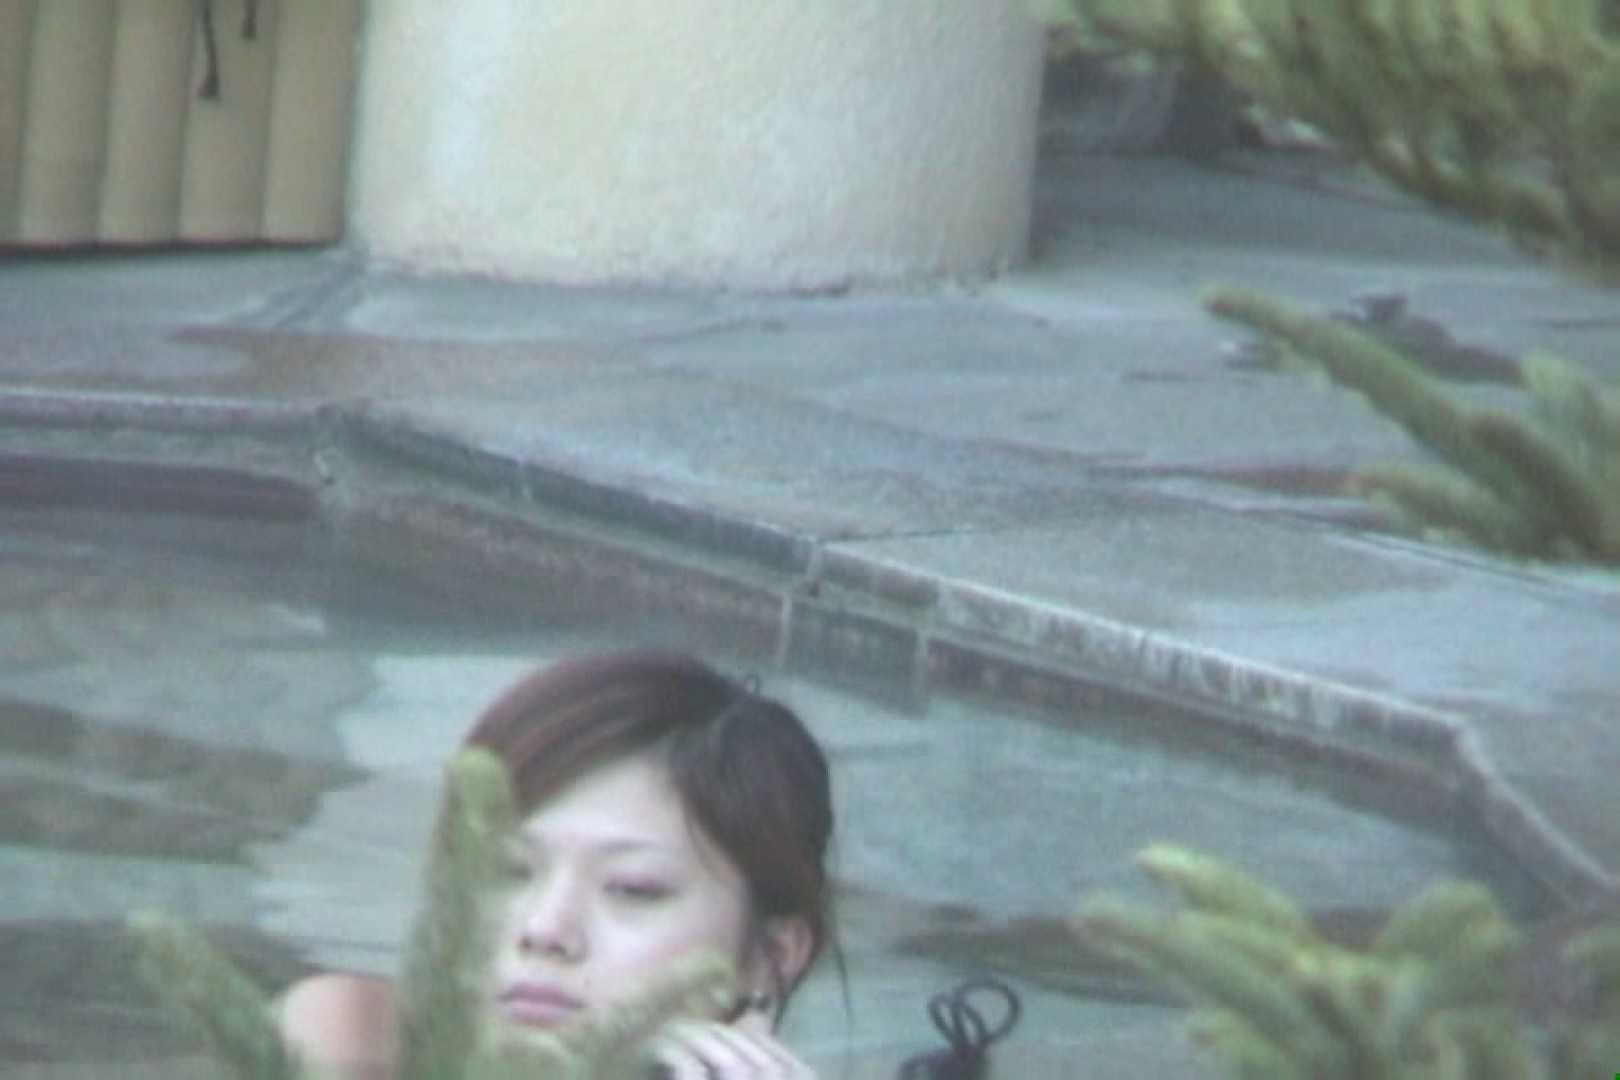 Aquaな露天風呂Vol.609 盗撮シリーズ   露天風呂編  107PIX 55